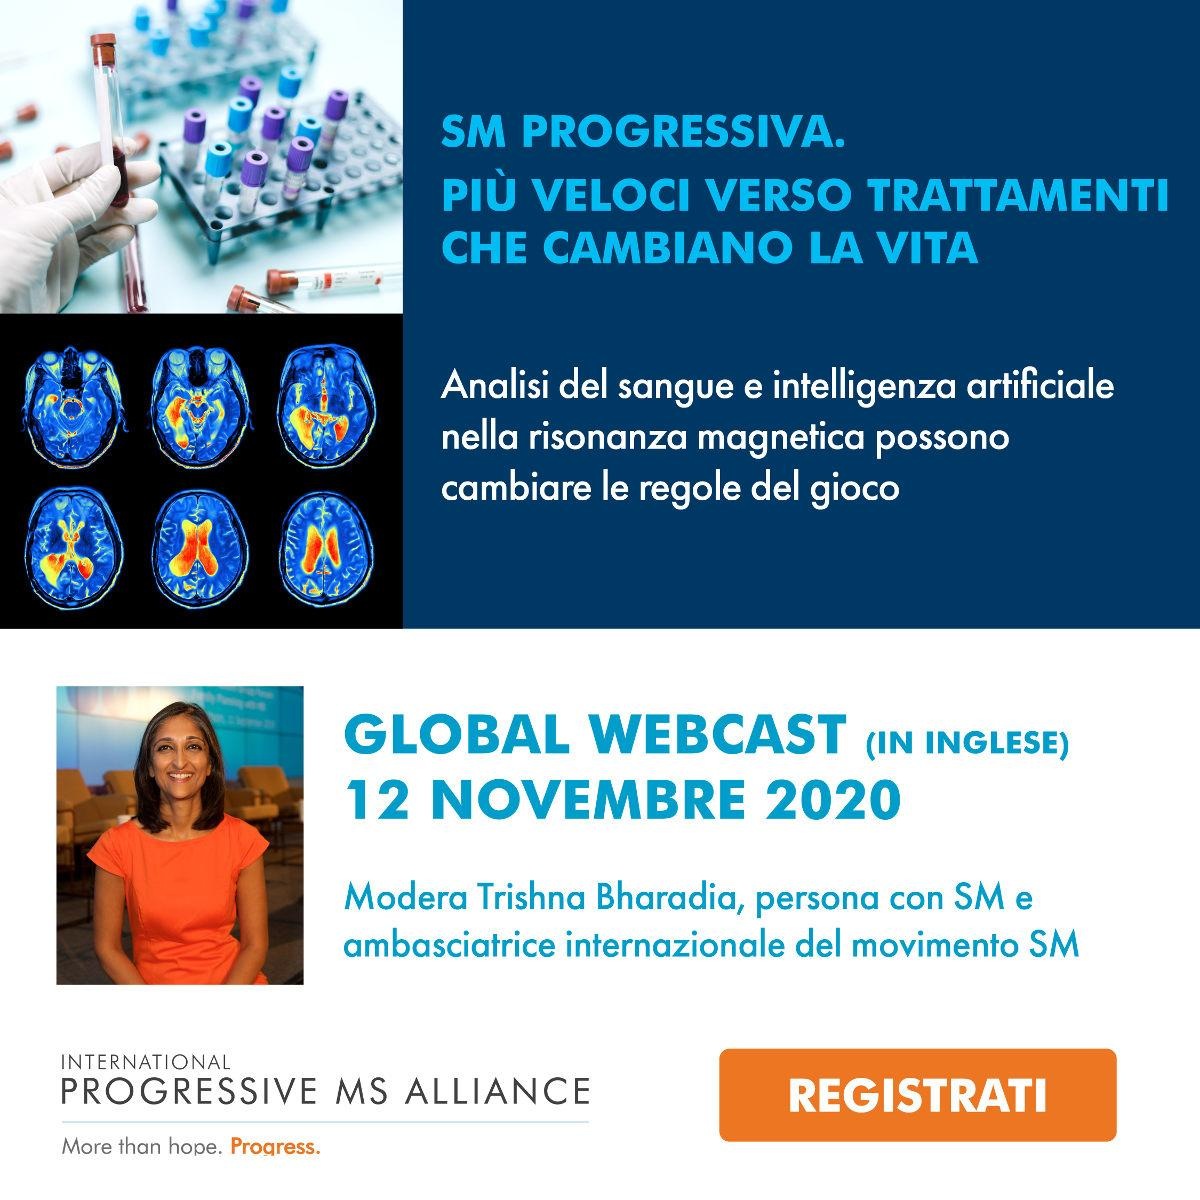 Progressive MS Alliance Global Webcast - 12 novembre 2020